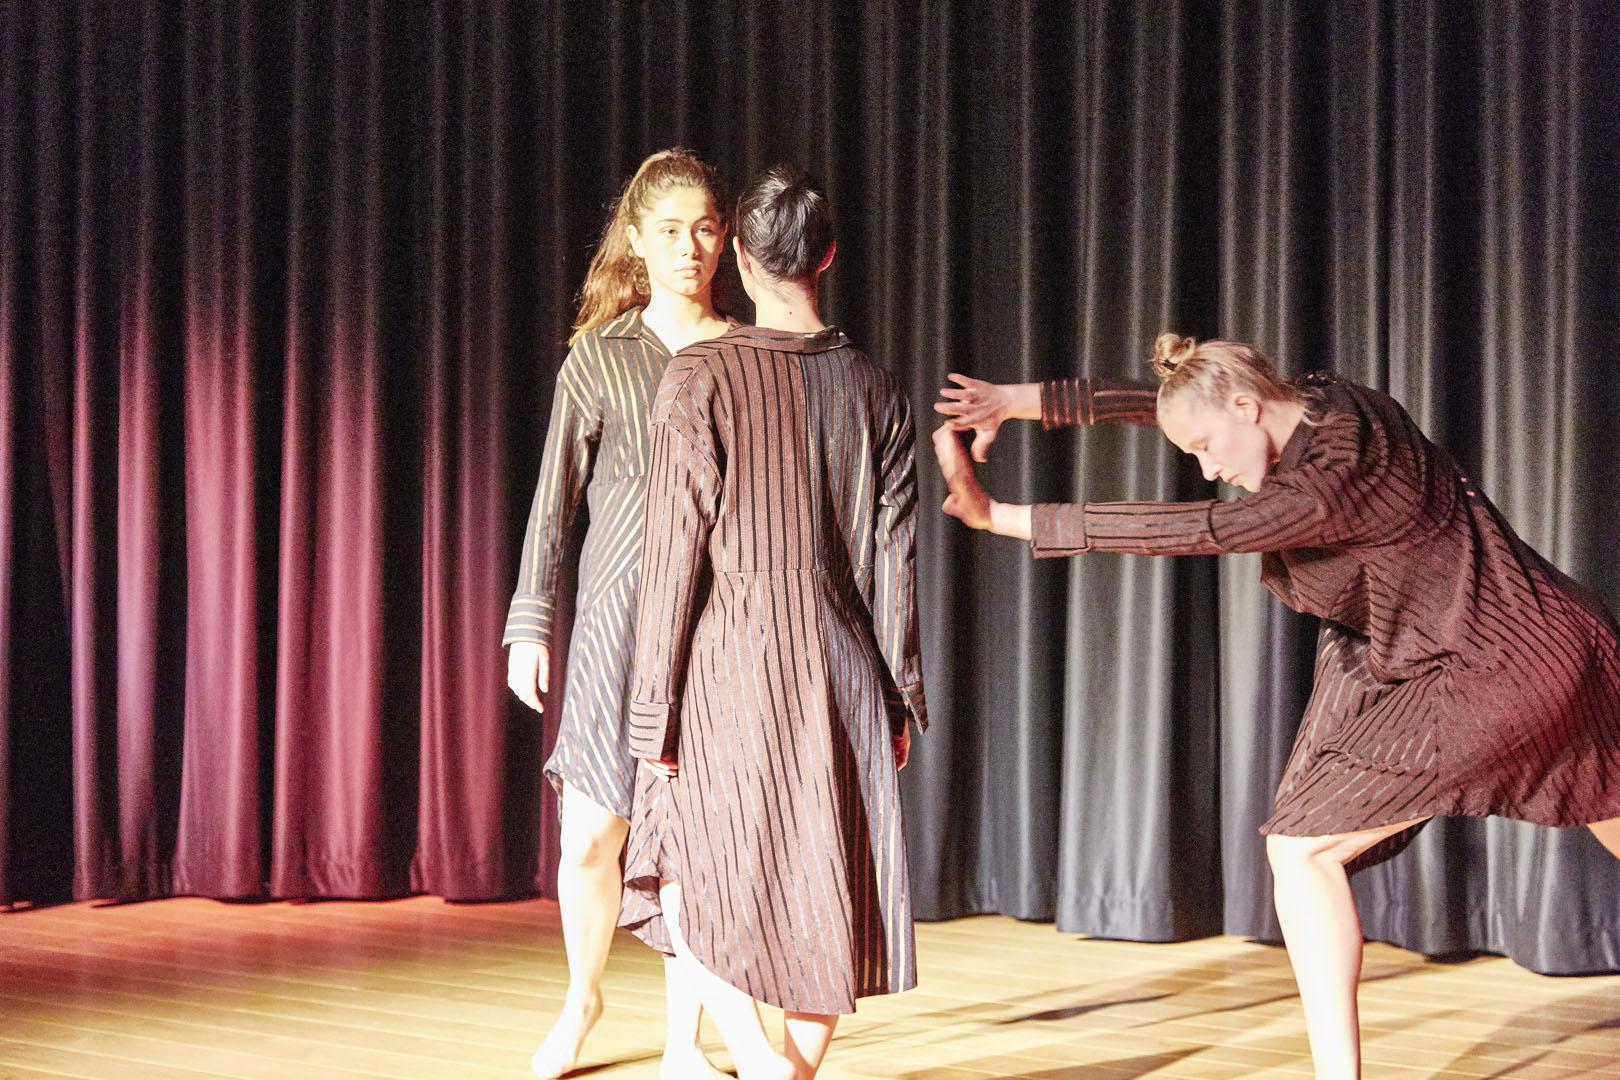 Oluwa naa Tanz Performance  Laureen Drechsler, Hanna-Christina Mannsberger und Agnes Smazinka